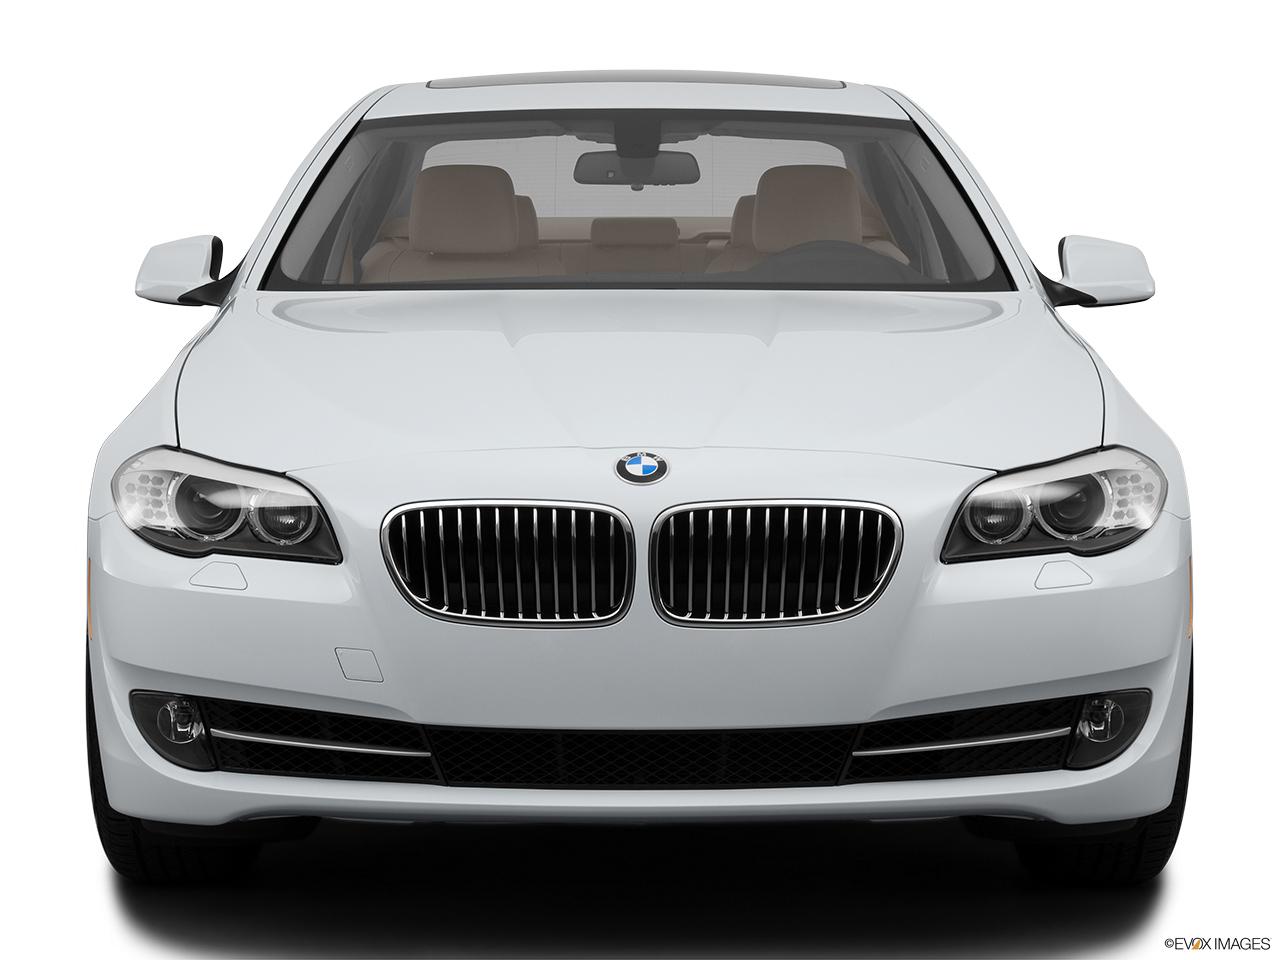 2014 Bmw 5 Series Maroon Interior Autos Post